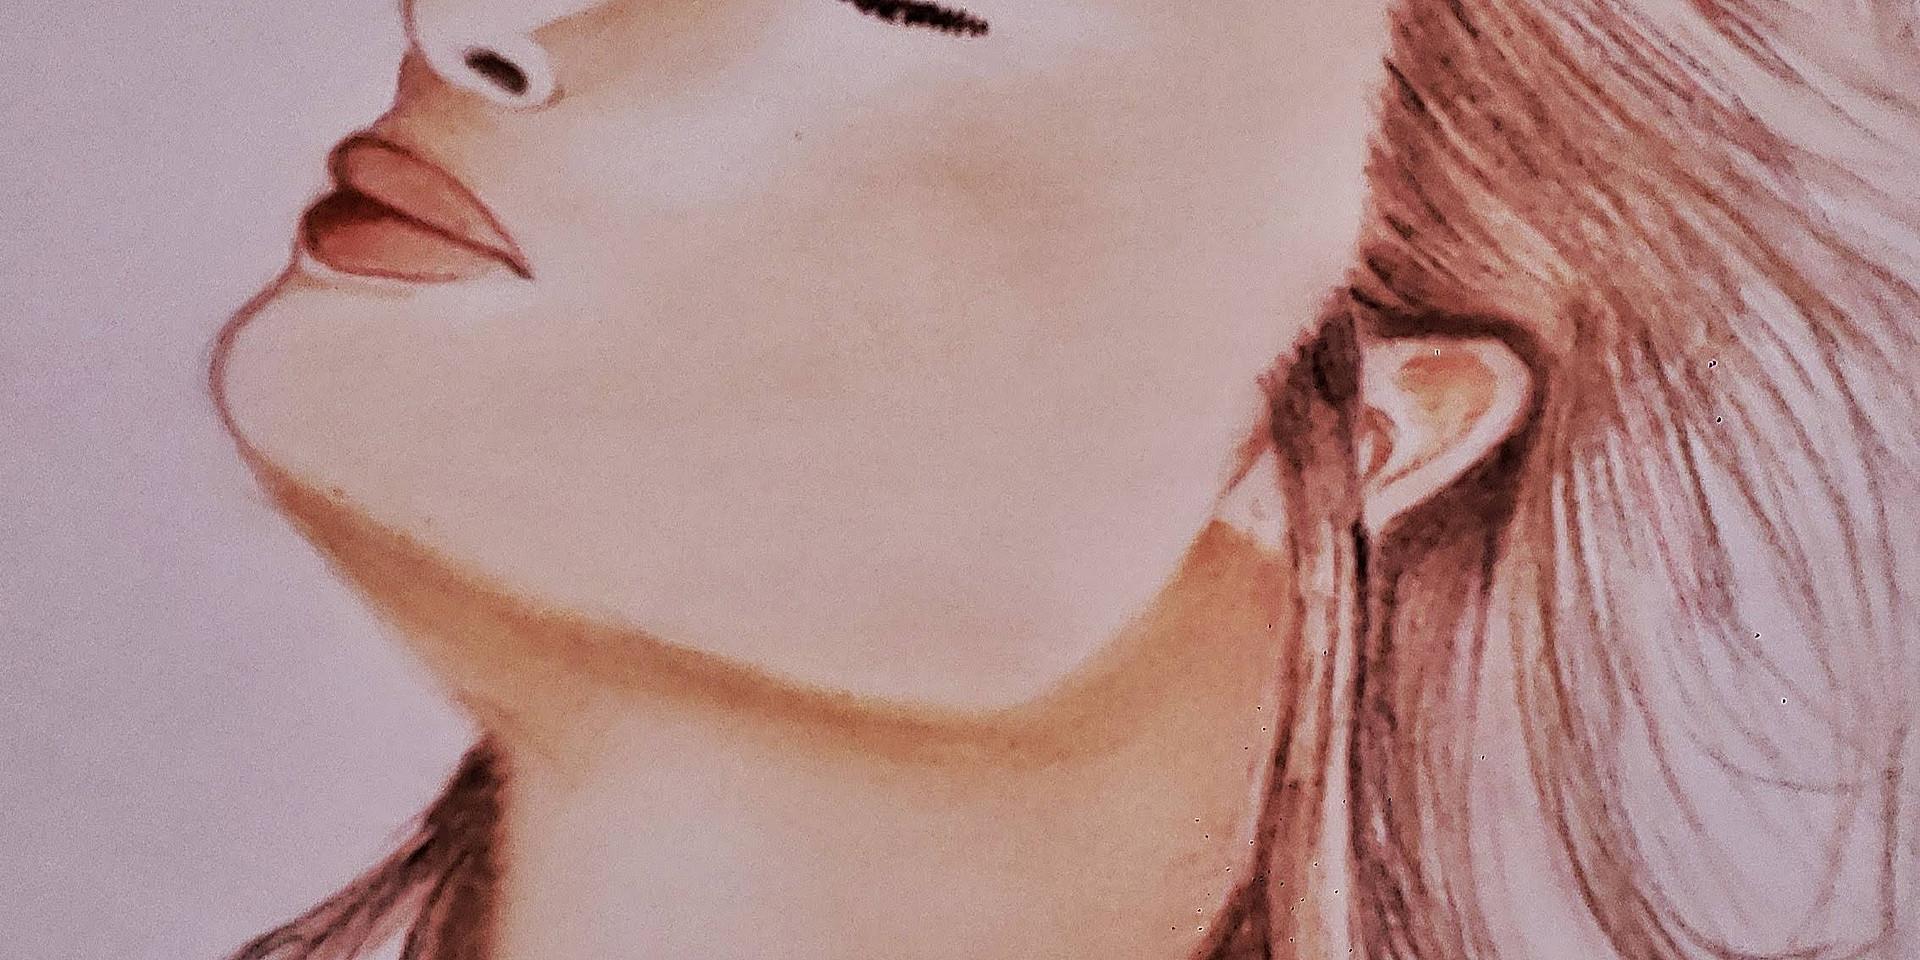 My first pastel sketching